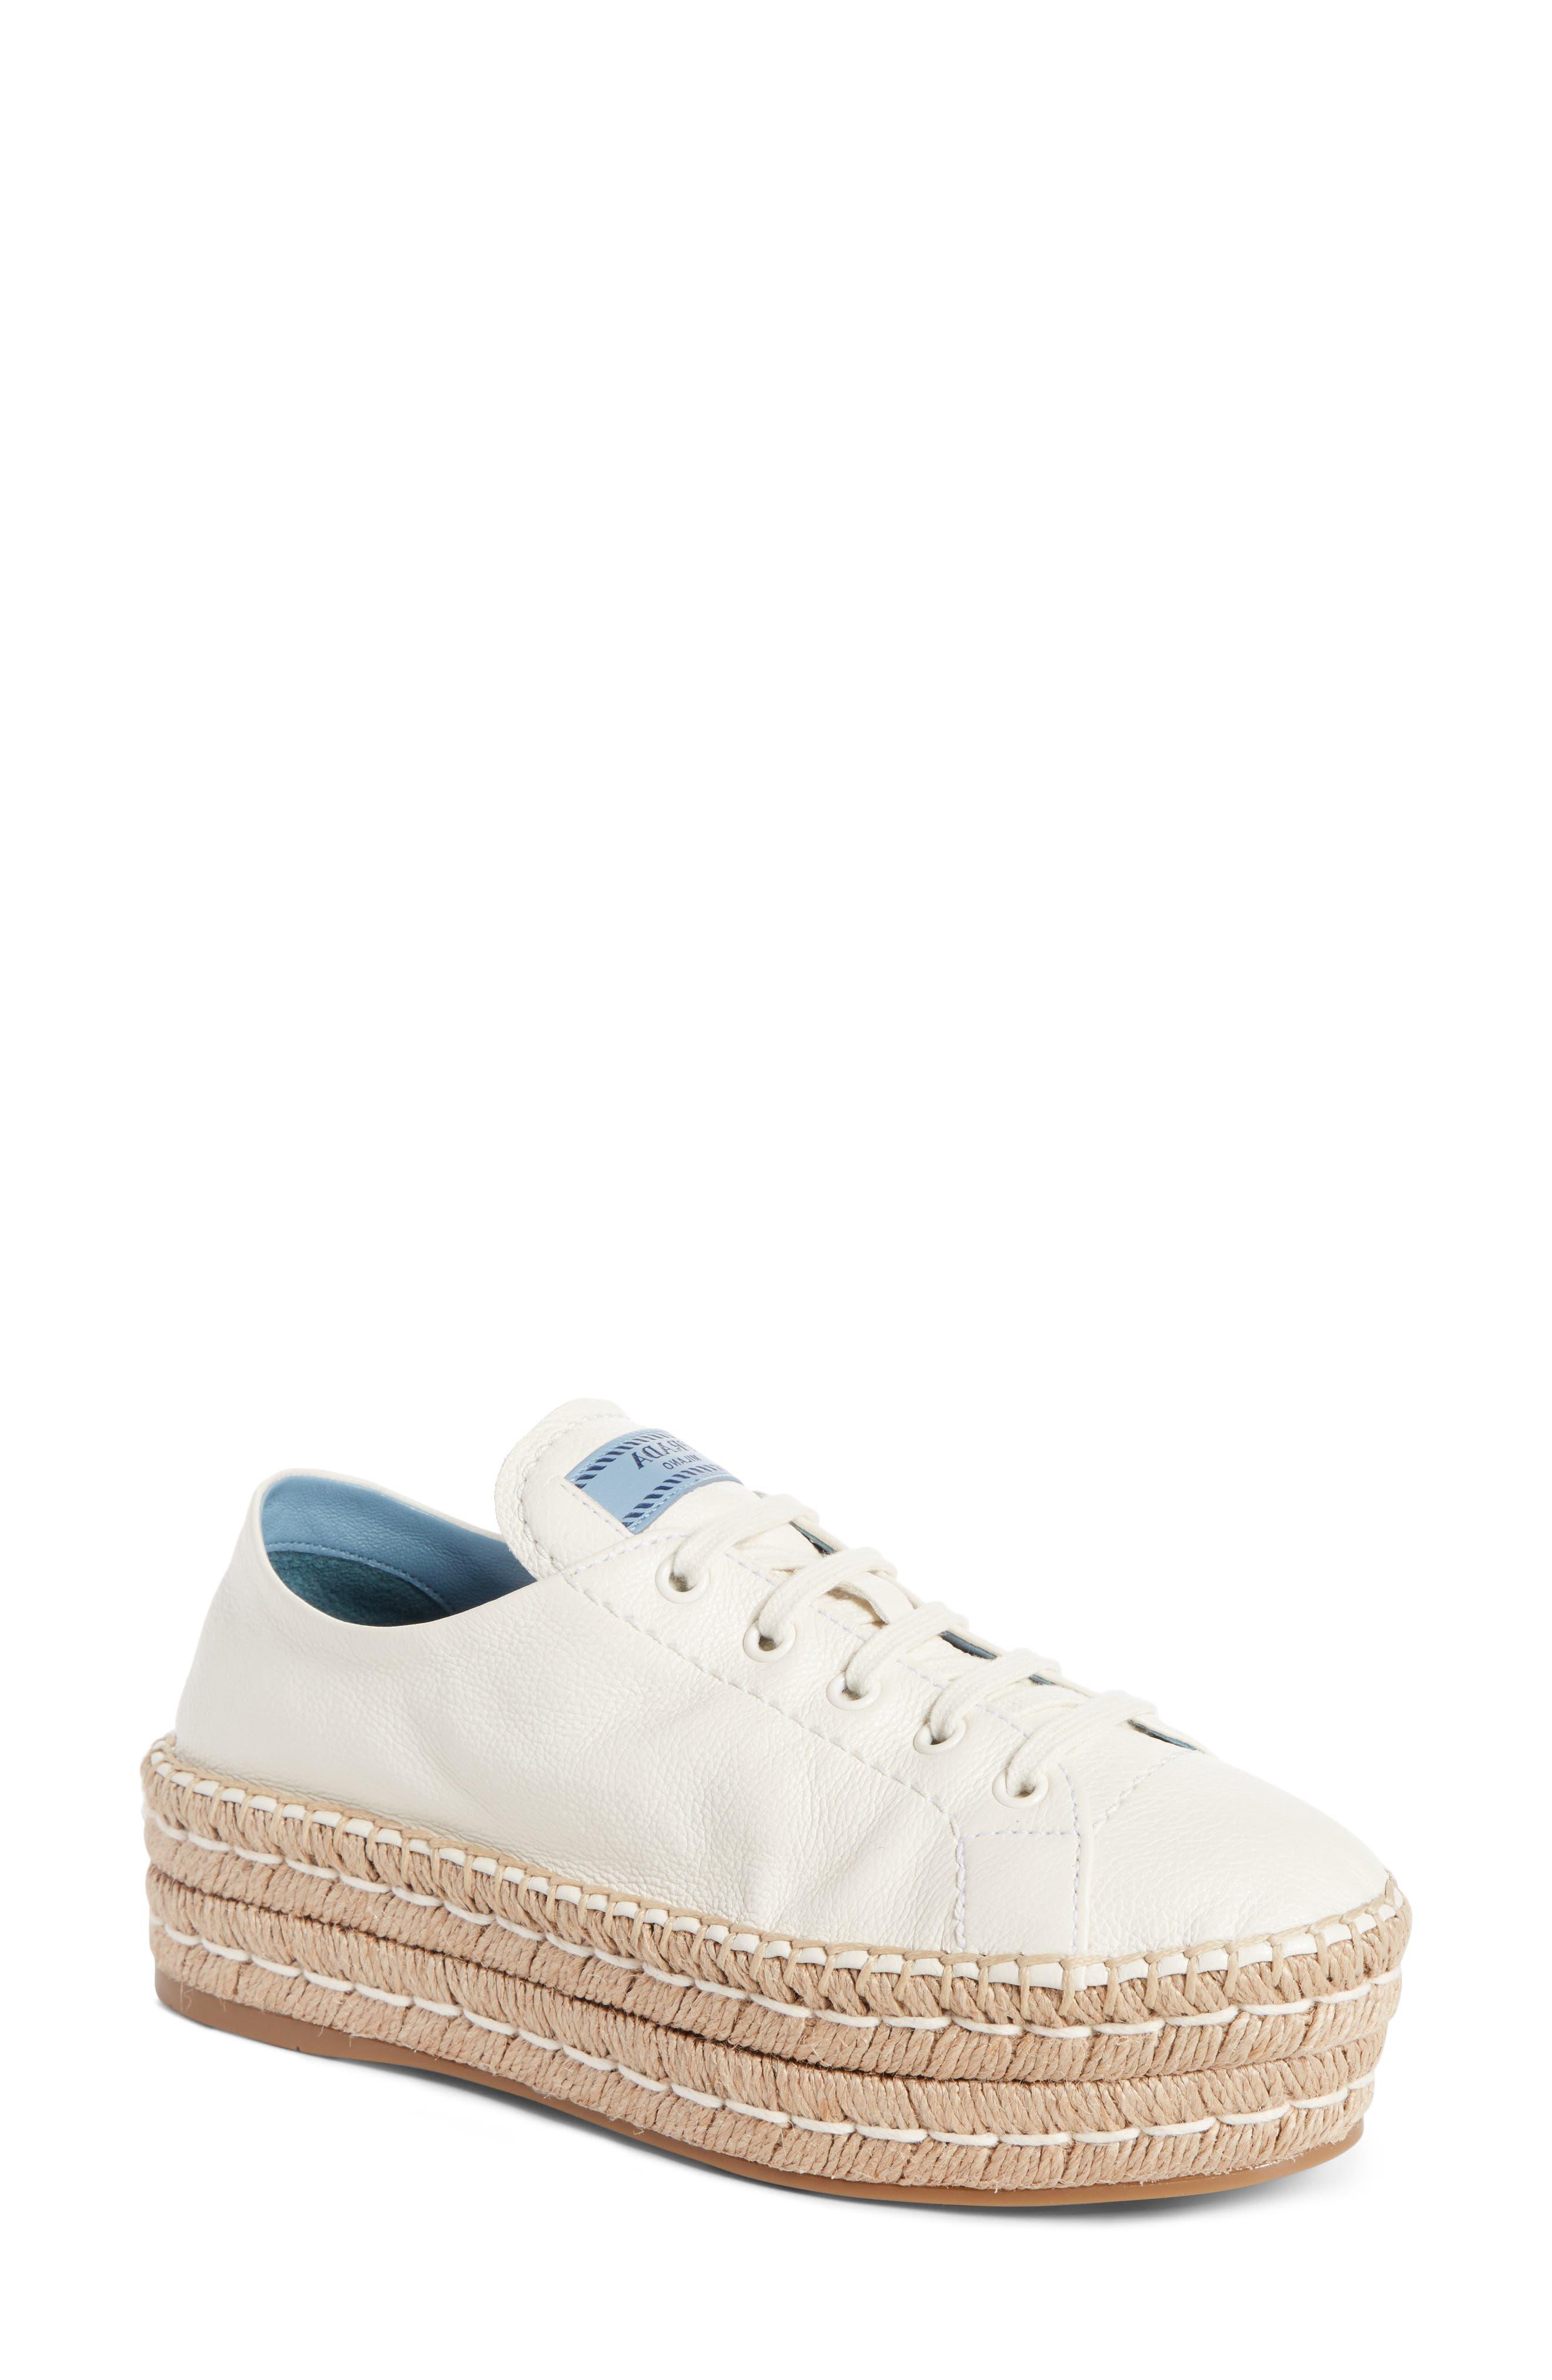 PRADA Flatform Espadrille Sneaker, Main, color, WHITE